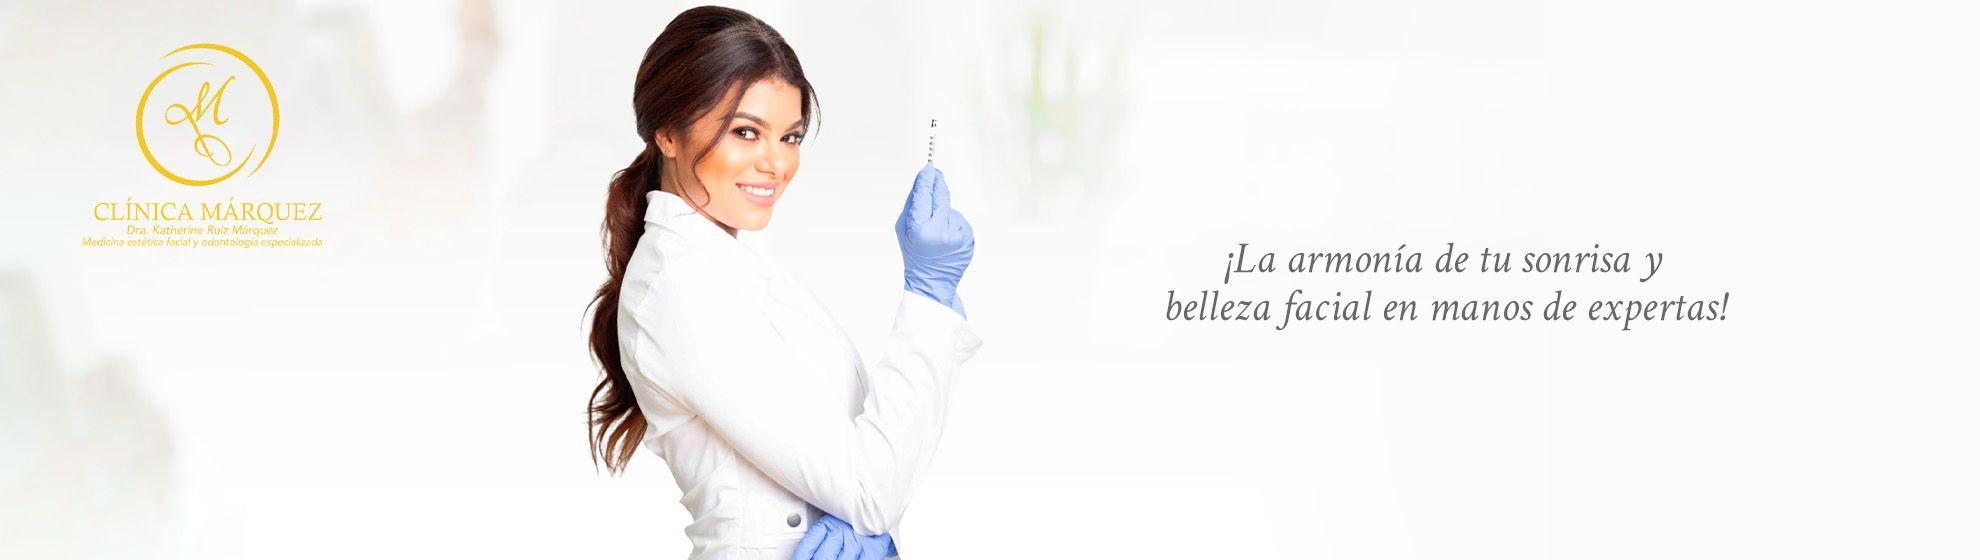 Dra. Katherin Ruiz Márquez